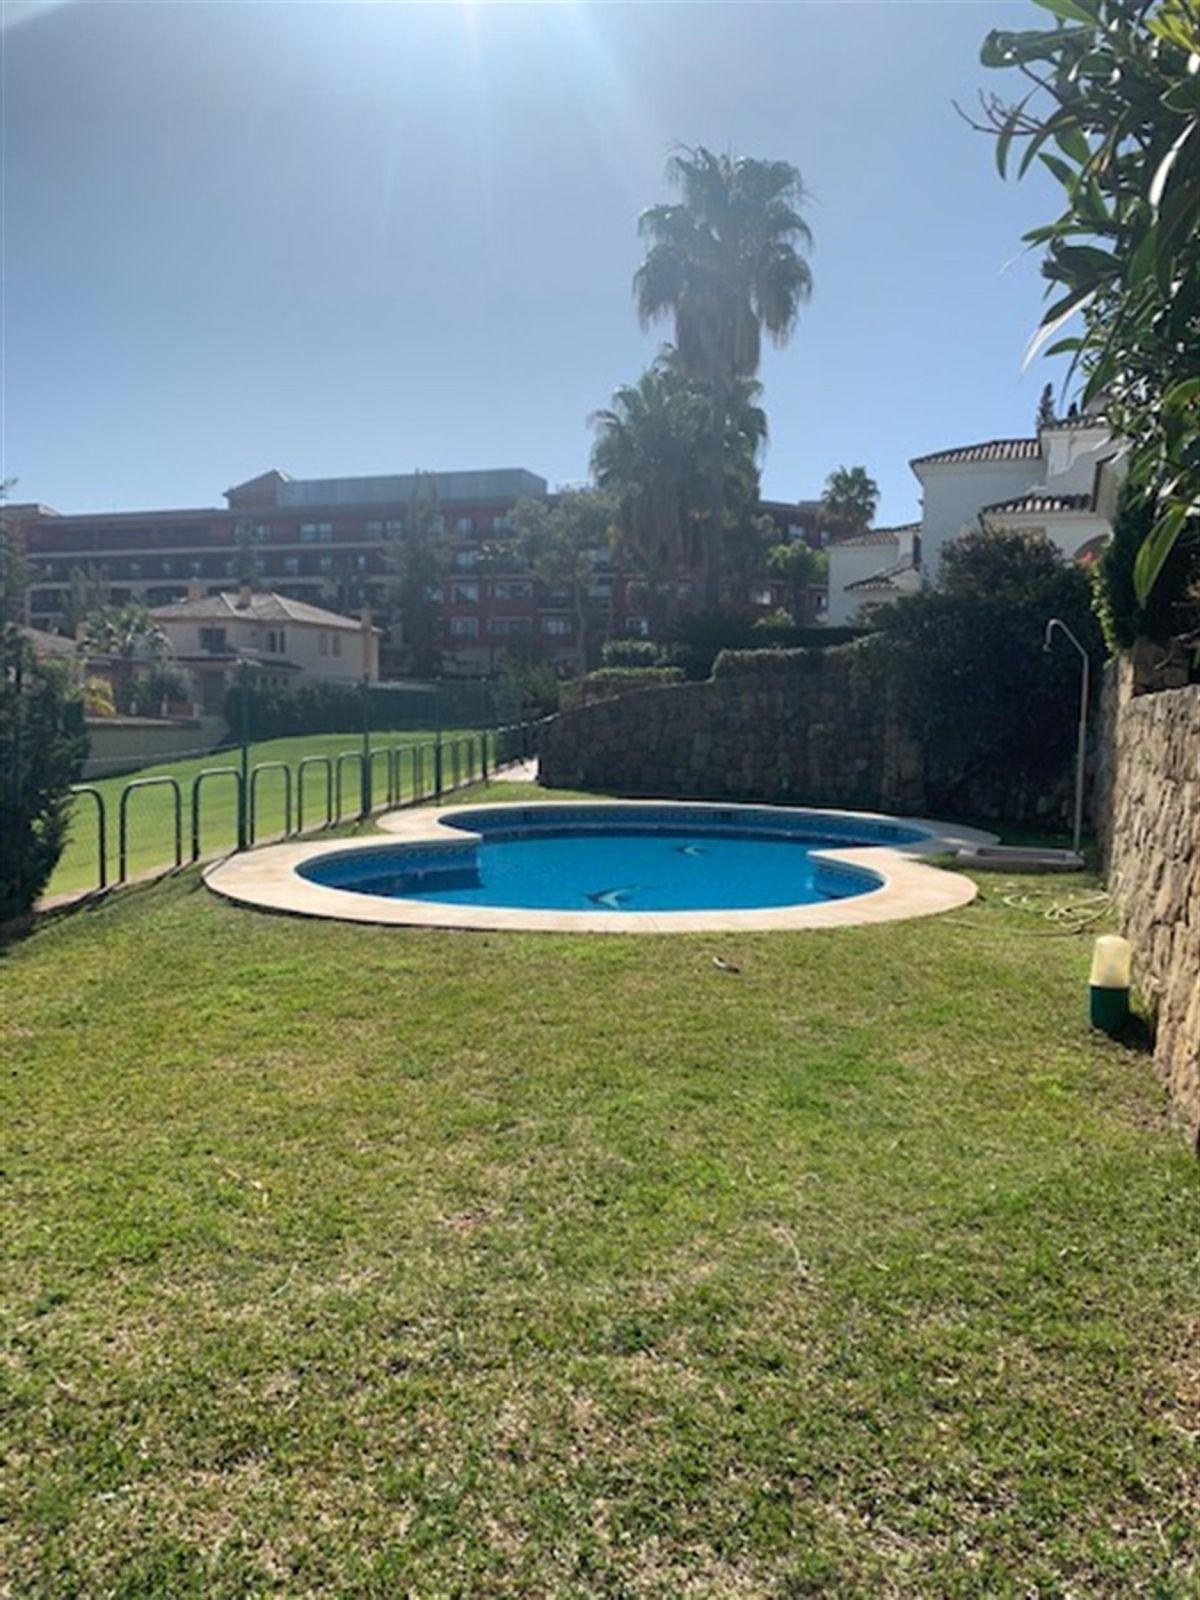 Guadalmina at the edge of San Pedro, this Fabulous Semi Detached home, boasting amazing views overlo,Spain